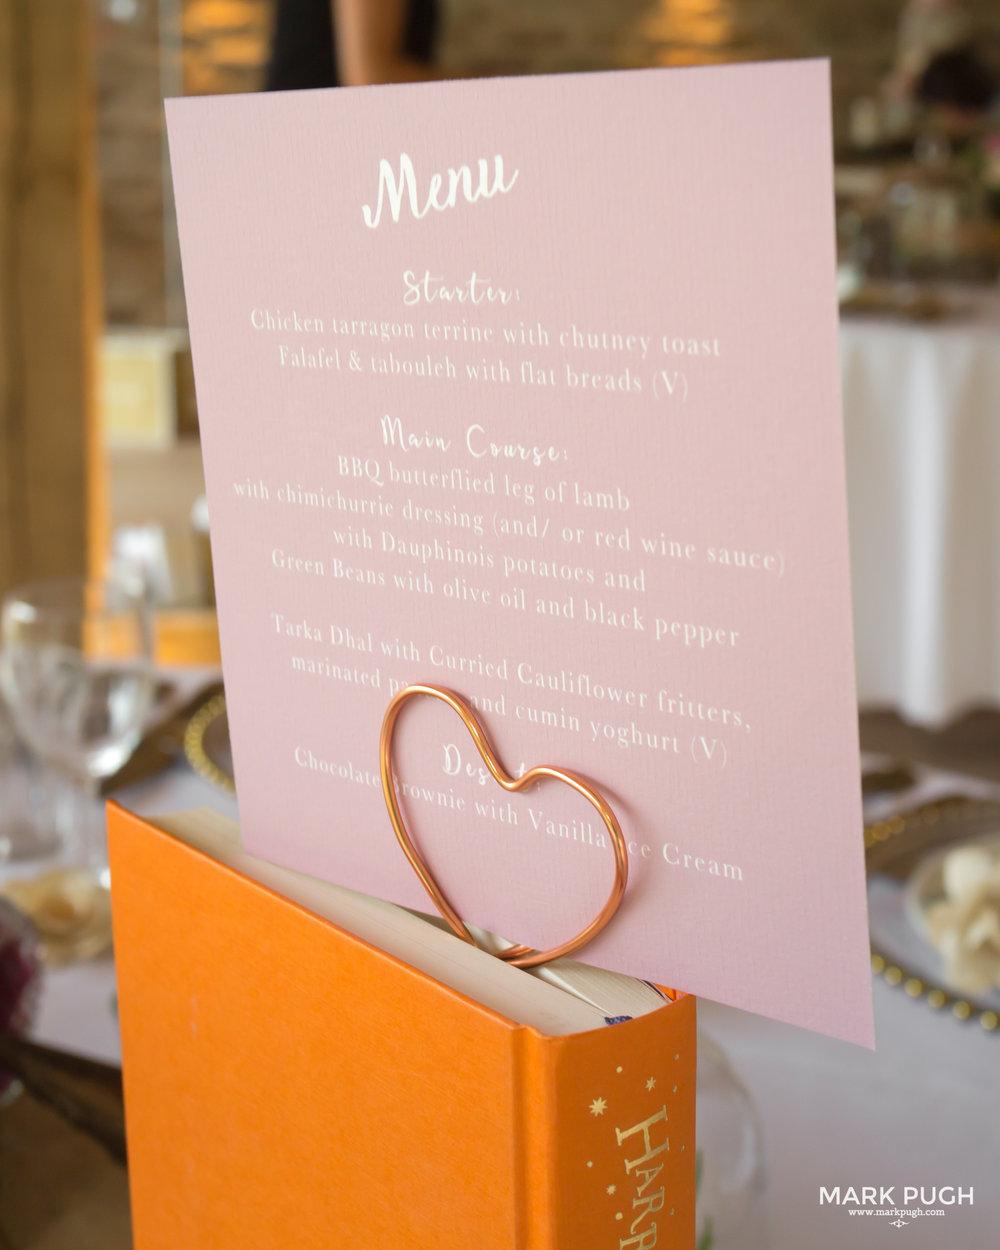 061 - Elloise and Ben - fineART wedding at Hazel Gap Barn NG22 9EY by www.markpugh.com Mark Pugh of www.mpmedia.co.uk_.JPG